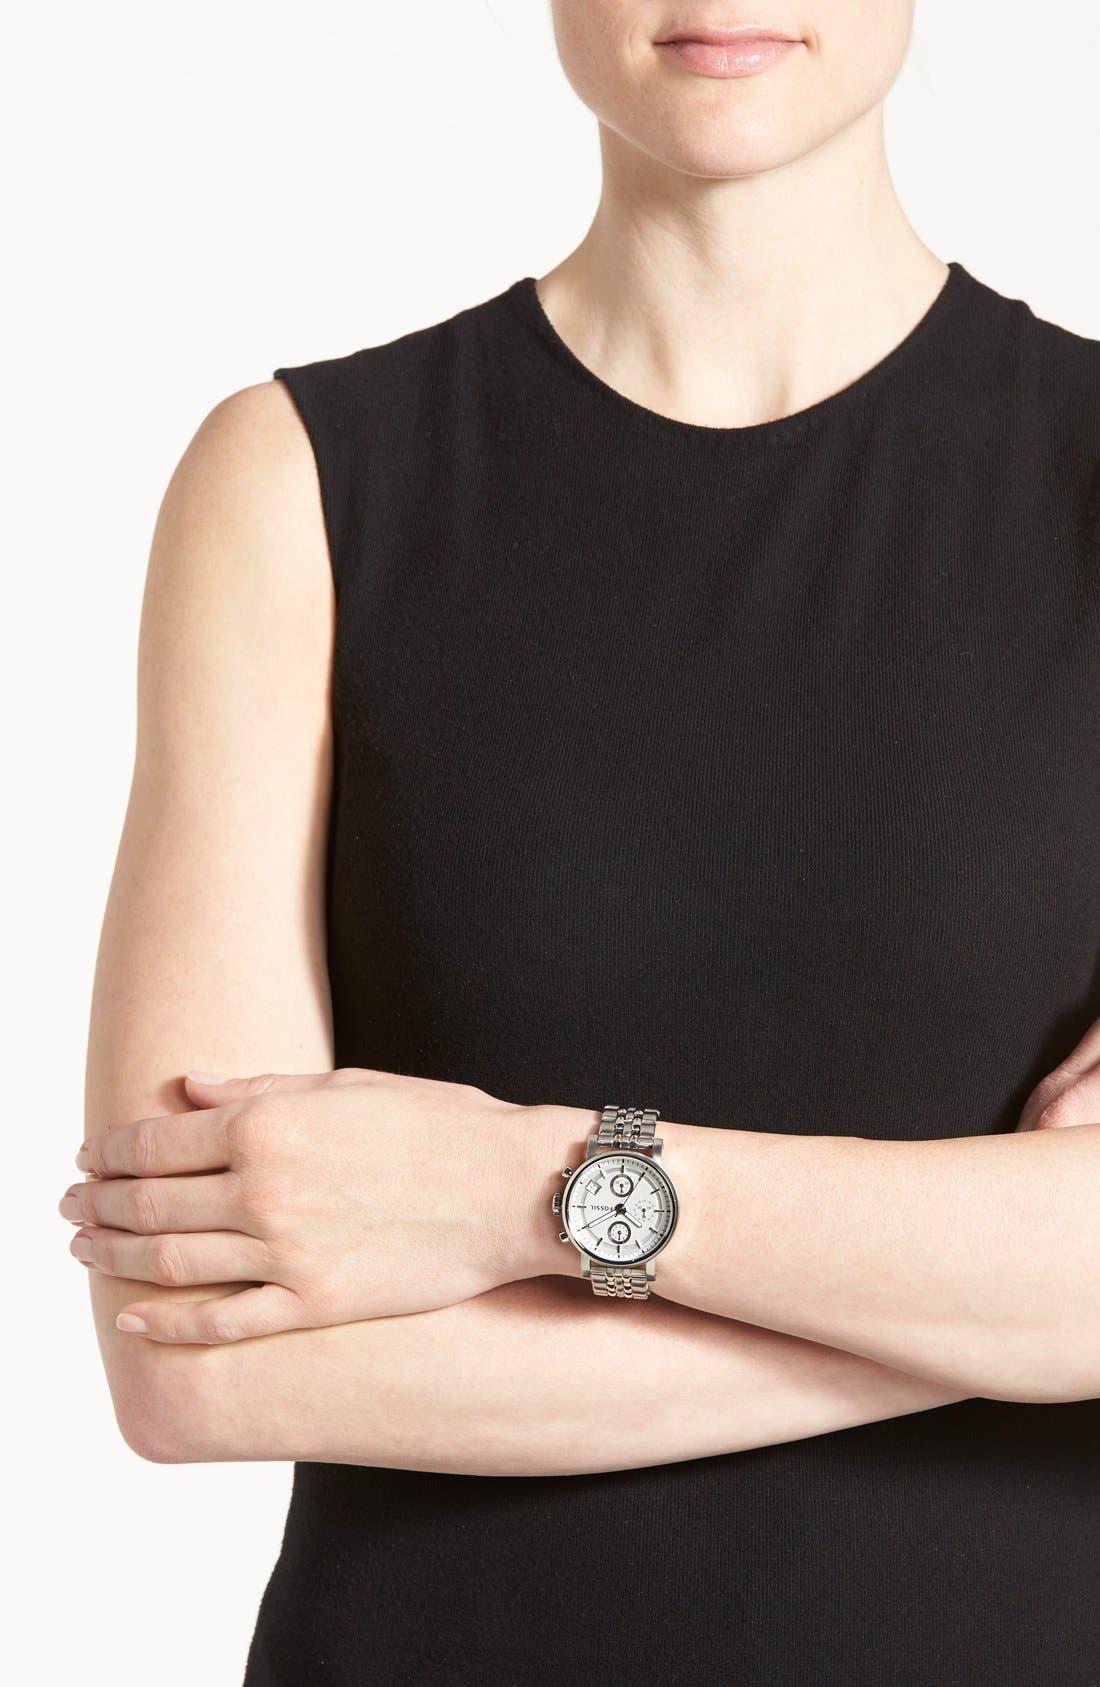 FOSSIL,                             'Original Boyfriend' Chronograph Bracelet Watch, 38mm,                             Alternate thumbnail 4, color,                             040